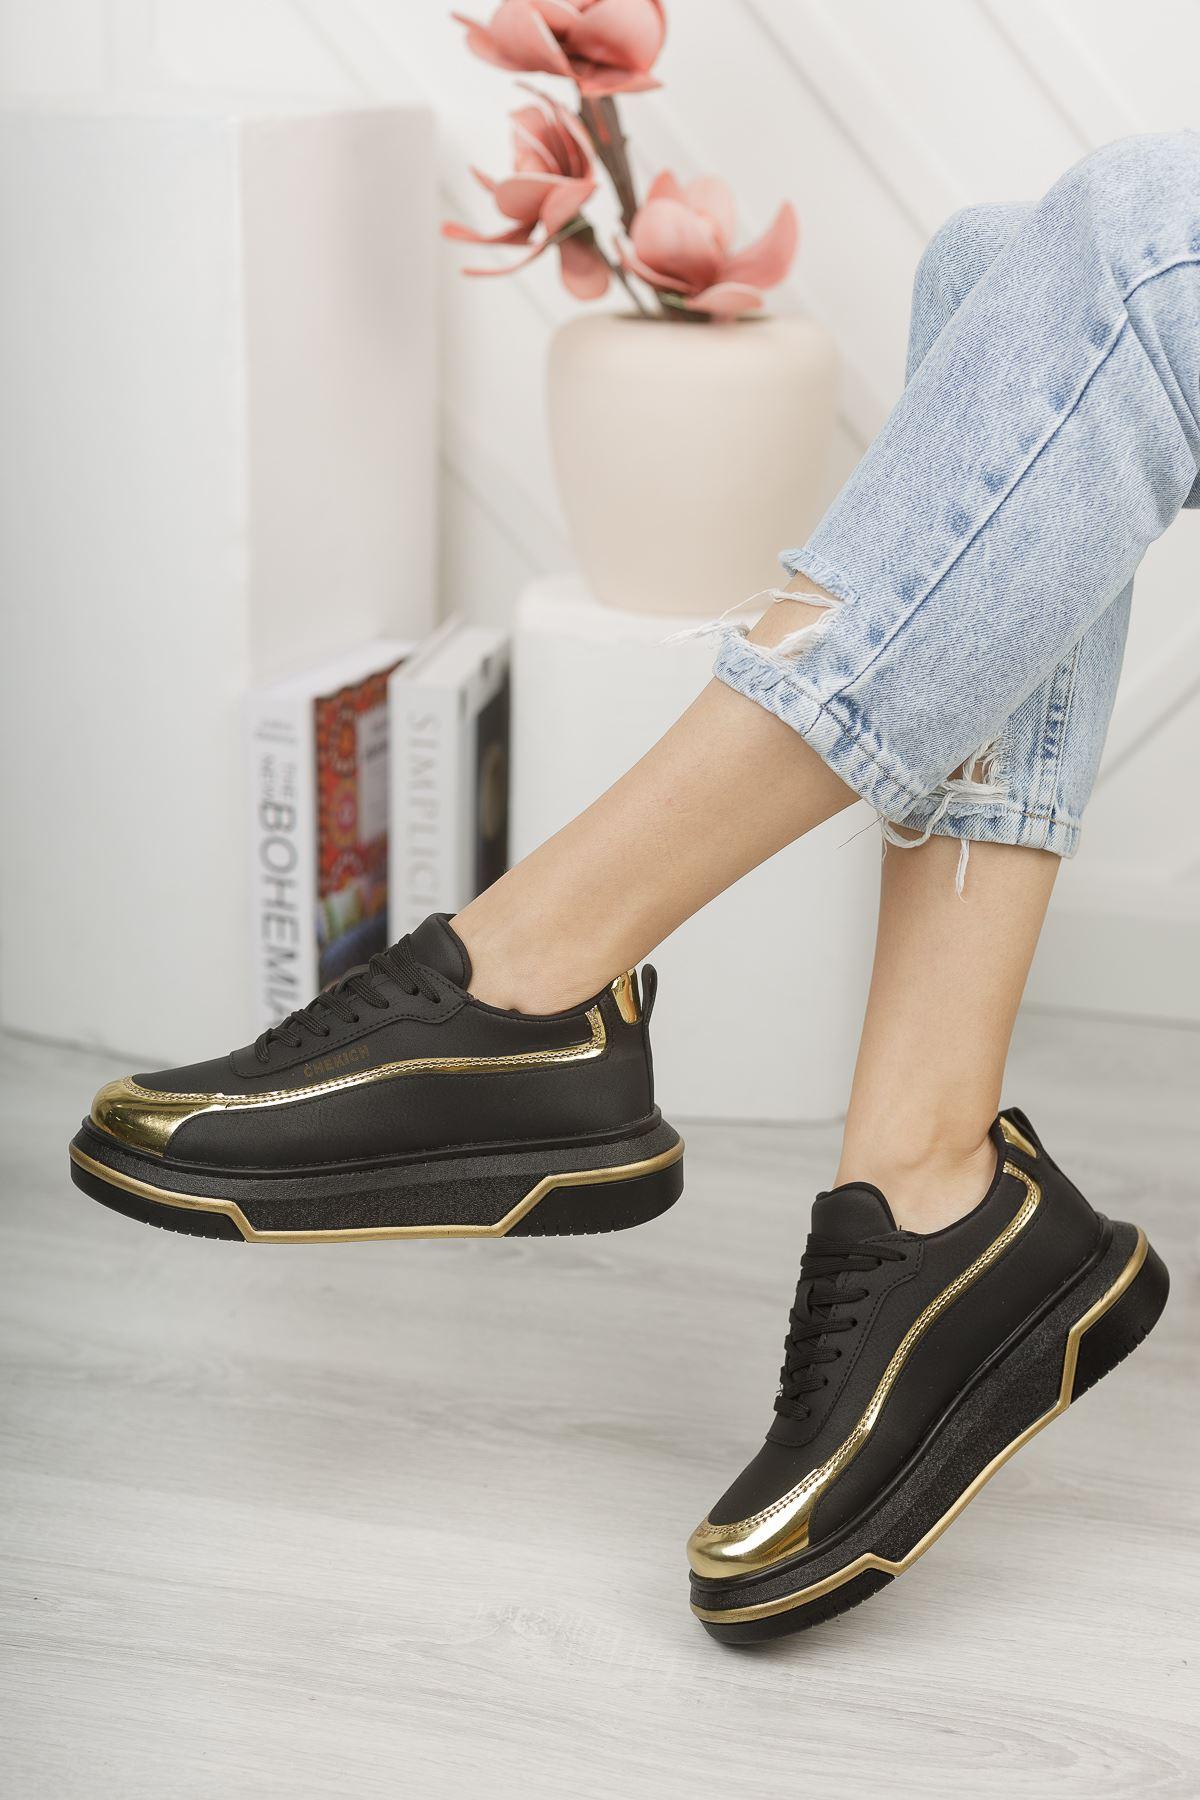 Chekich CH041 ST Kadın Ayakkabı SİYAH / ALTIN